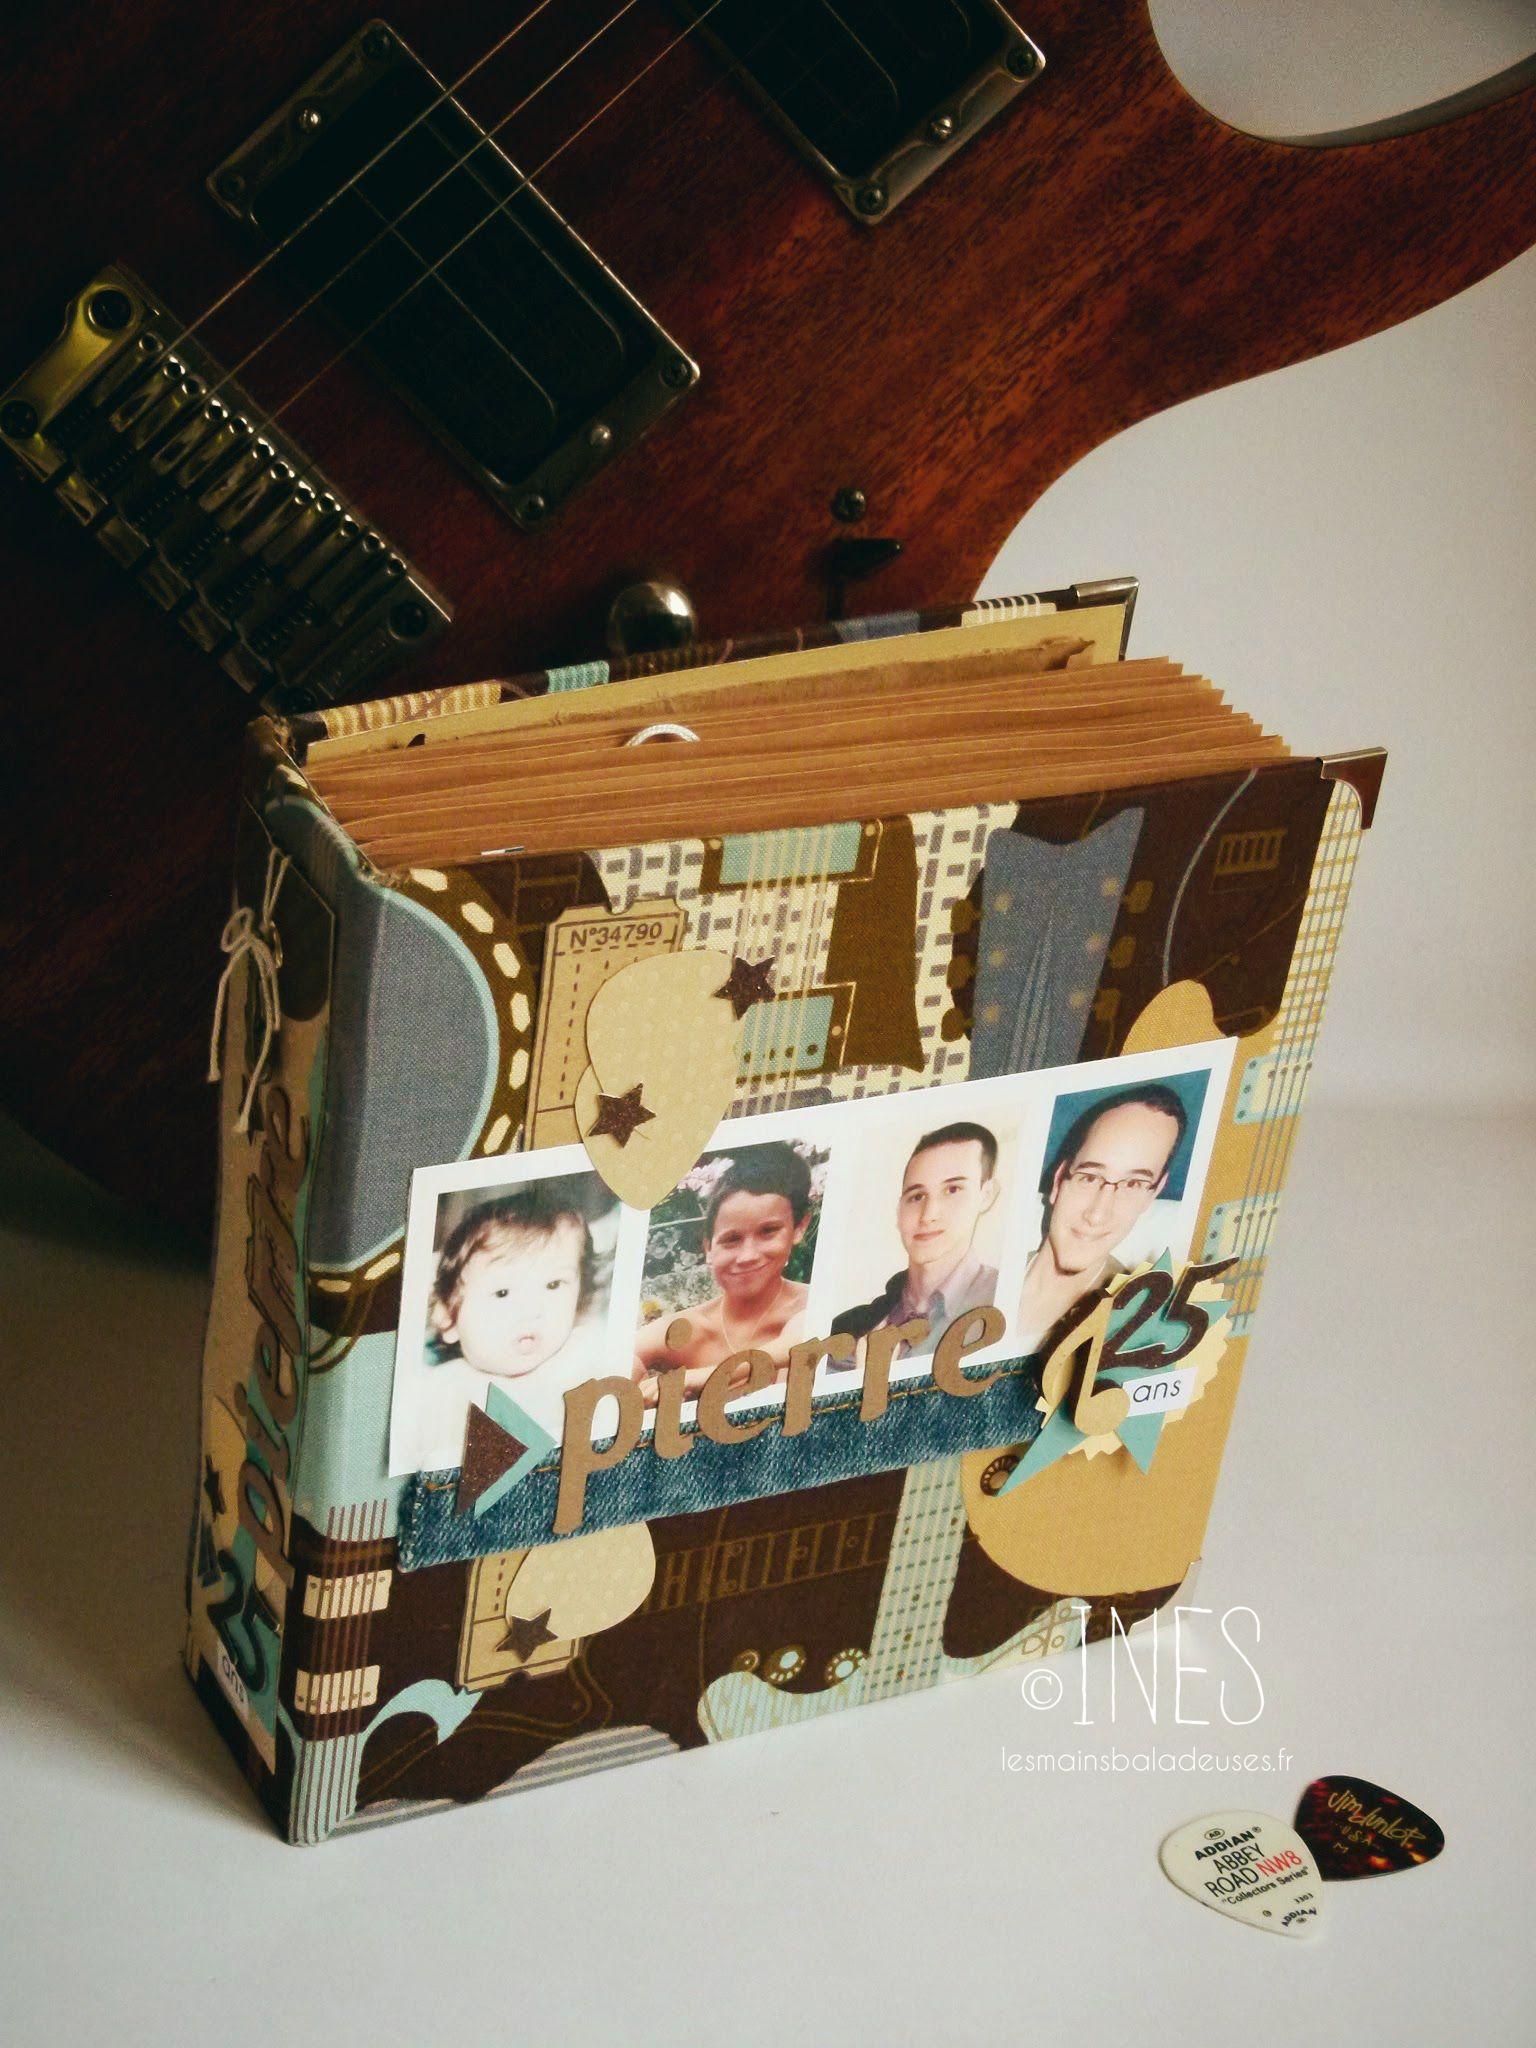 Album scrapbooking anniversaire masculin thème guitare / musique. / Scrapbooking album for a man's birthday, guitar and music theme.  https://www.facebook.com/lesmainsbaladeuses